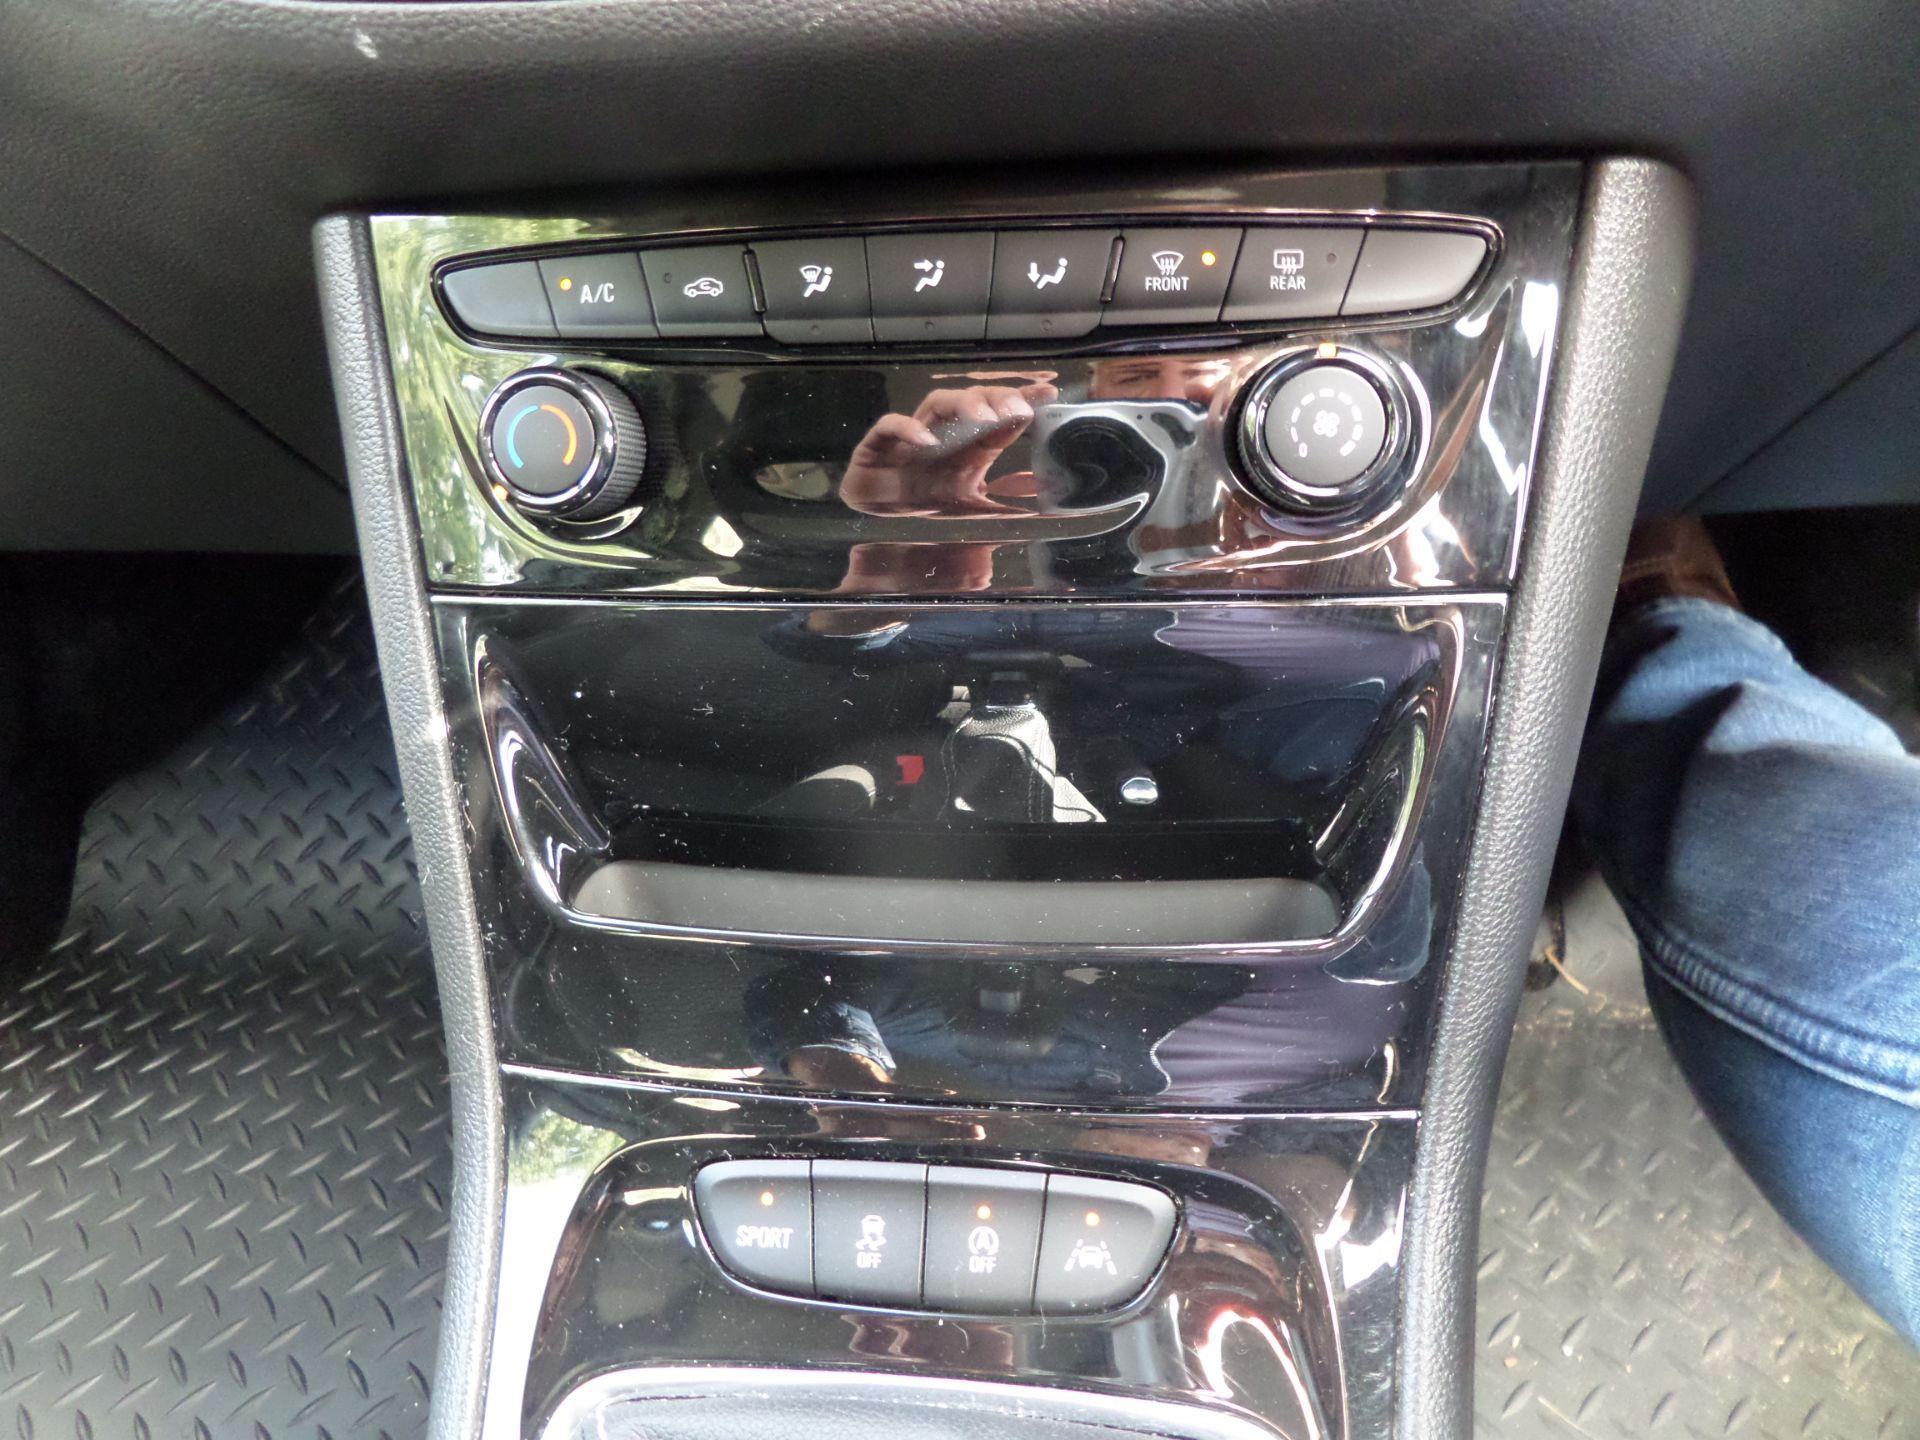 2018 Vauxhall Astra 1.6 Cdti 16V 136 Sri Nav 5Dr Euro 6 (DP18VCN) Image 14